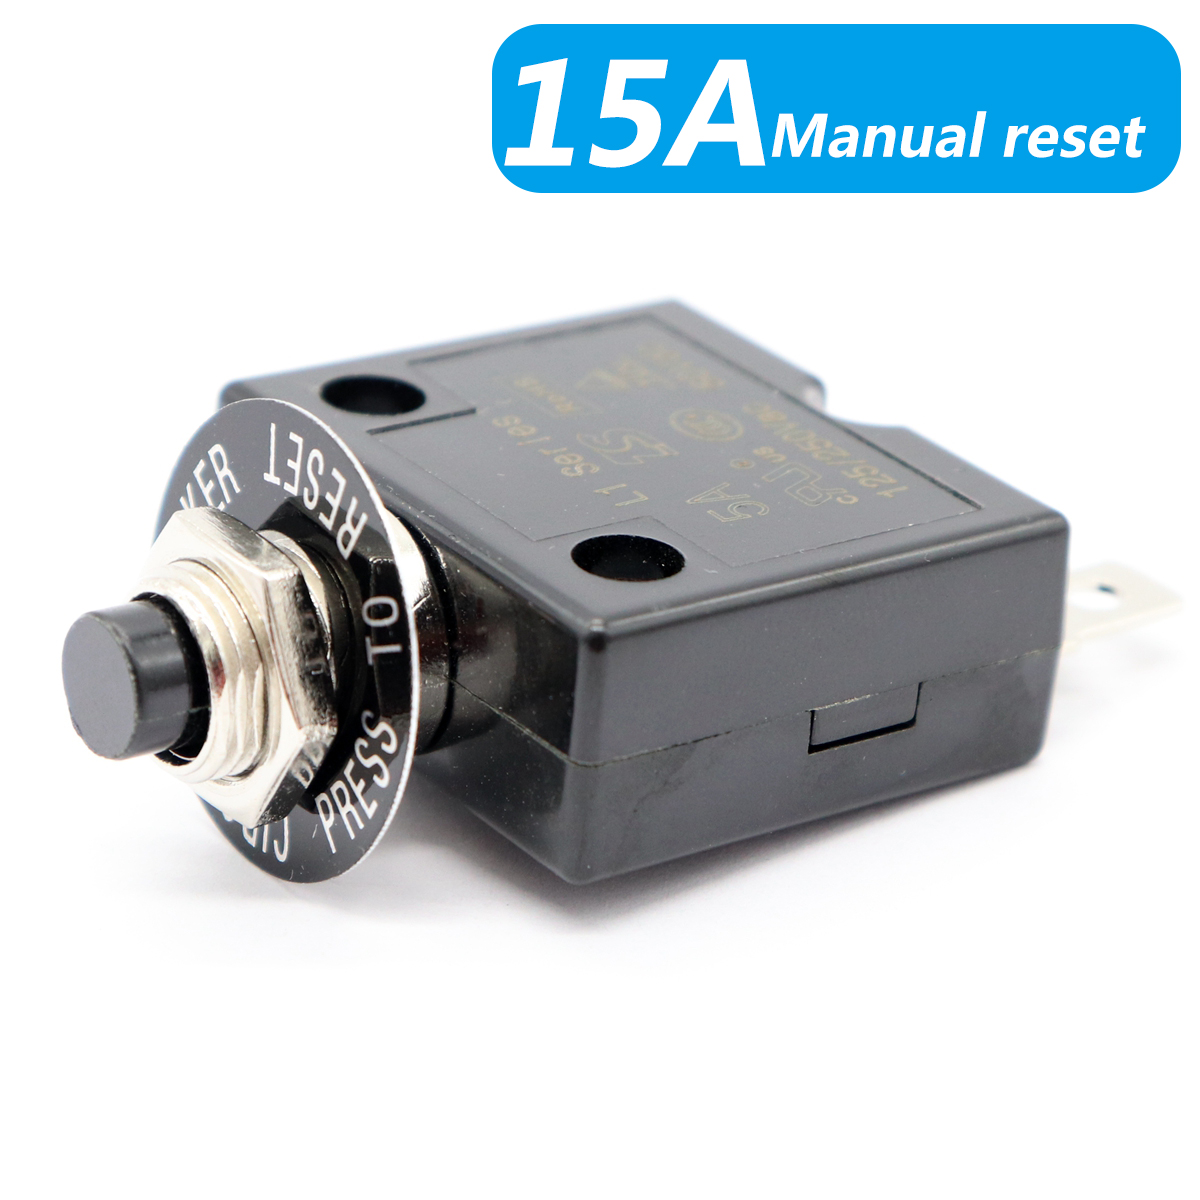 15 Amp Thermal Circuit Breaker AC DC 15a Push-to-Reset